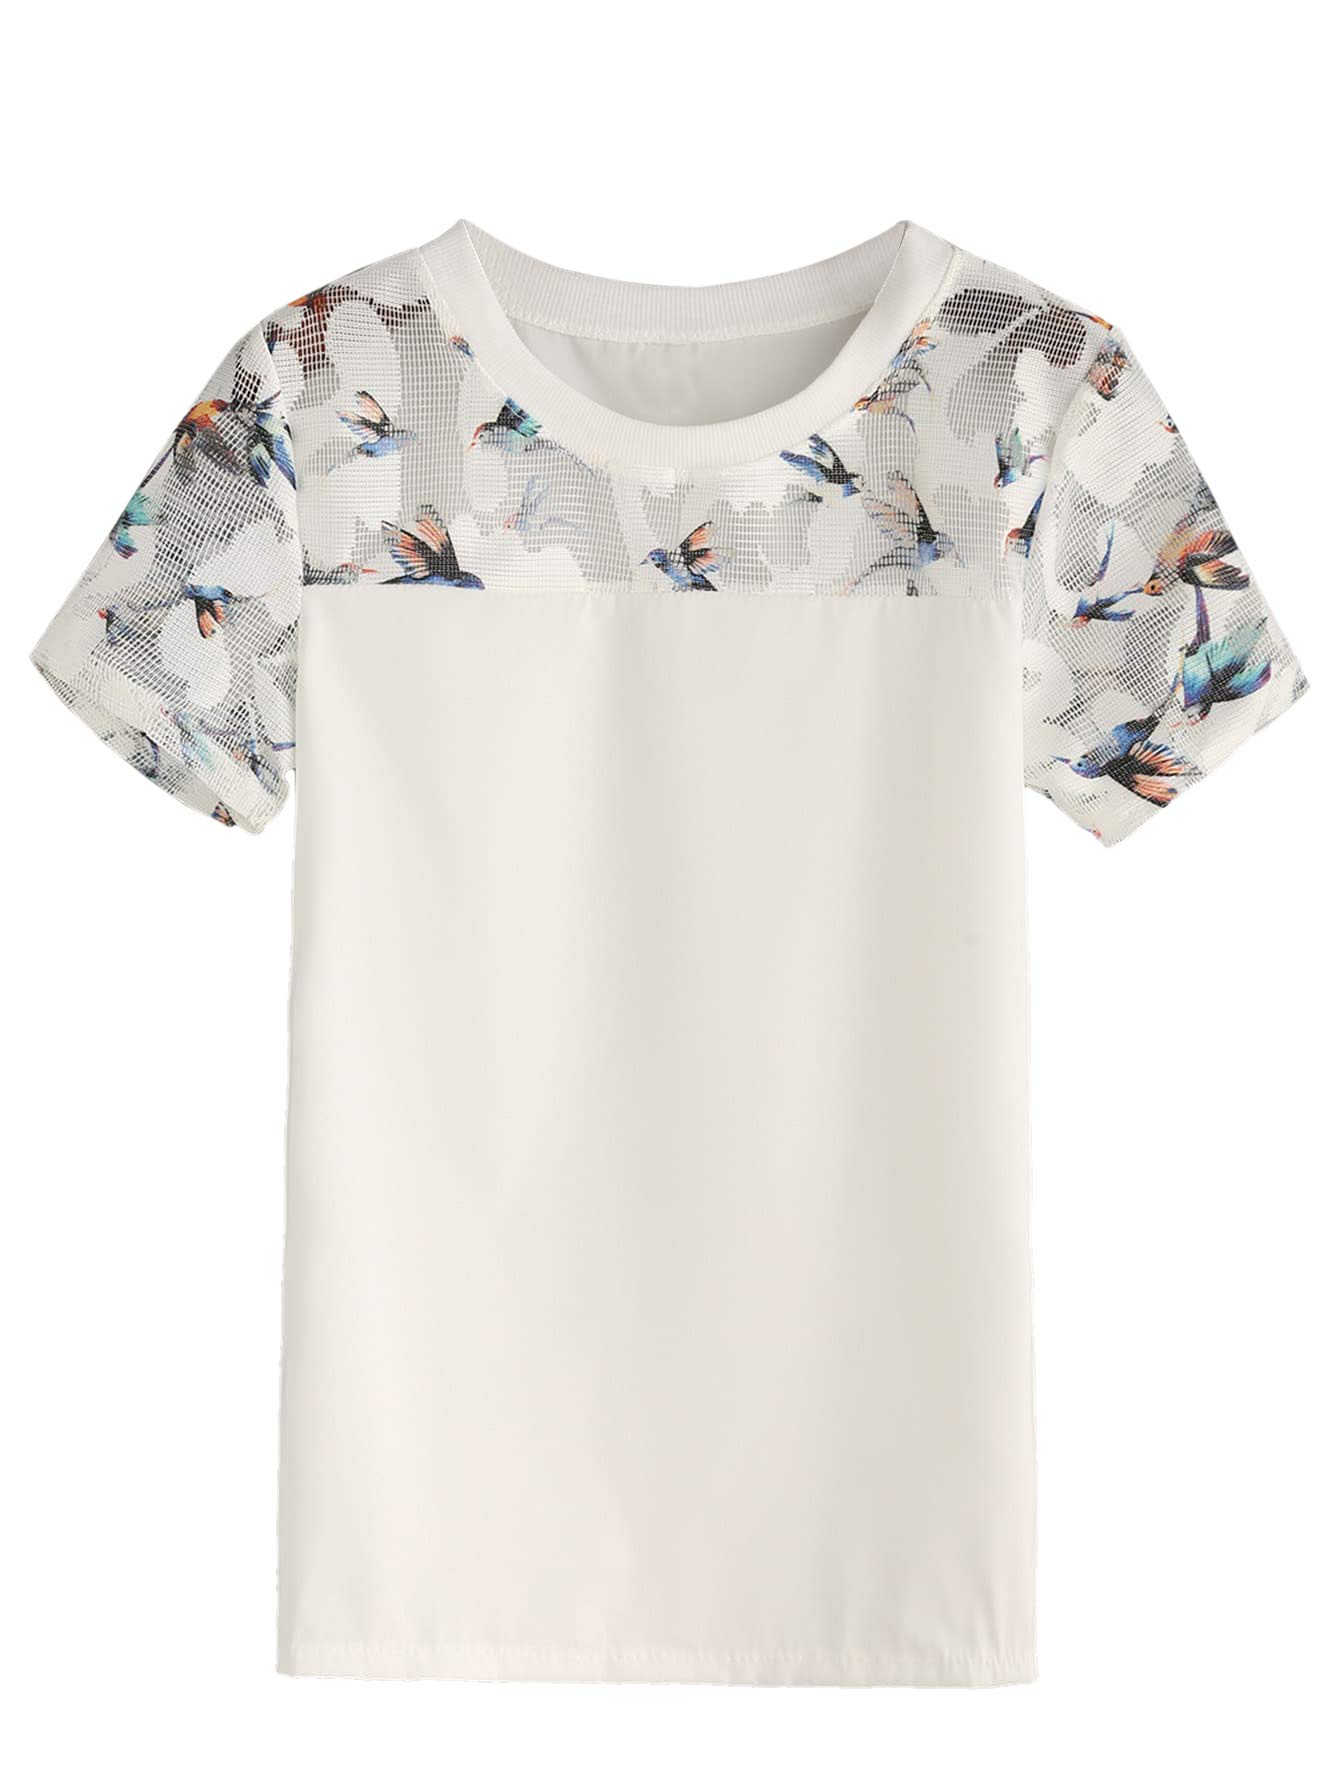 SheIn Women's Summer Short Sleeve Bird Print Mesh Blouse Shirt Top White XS